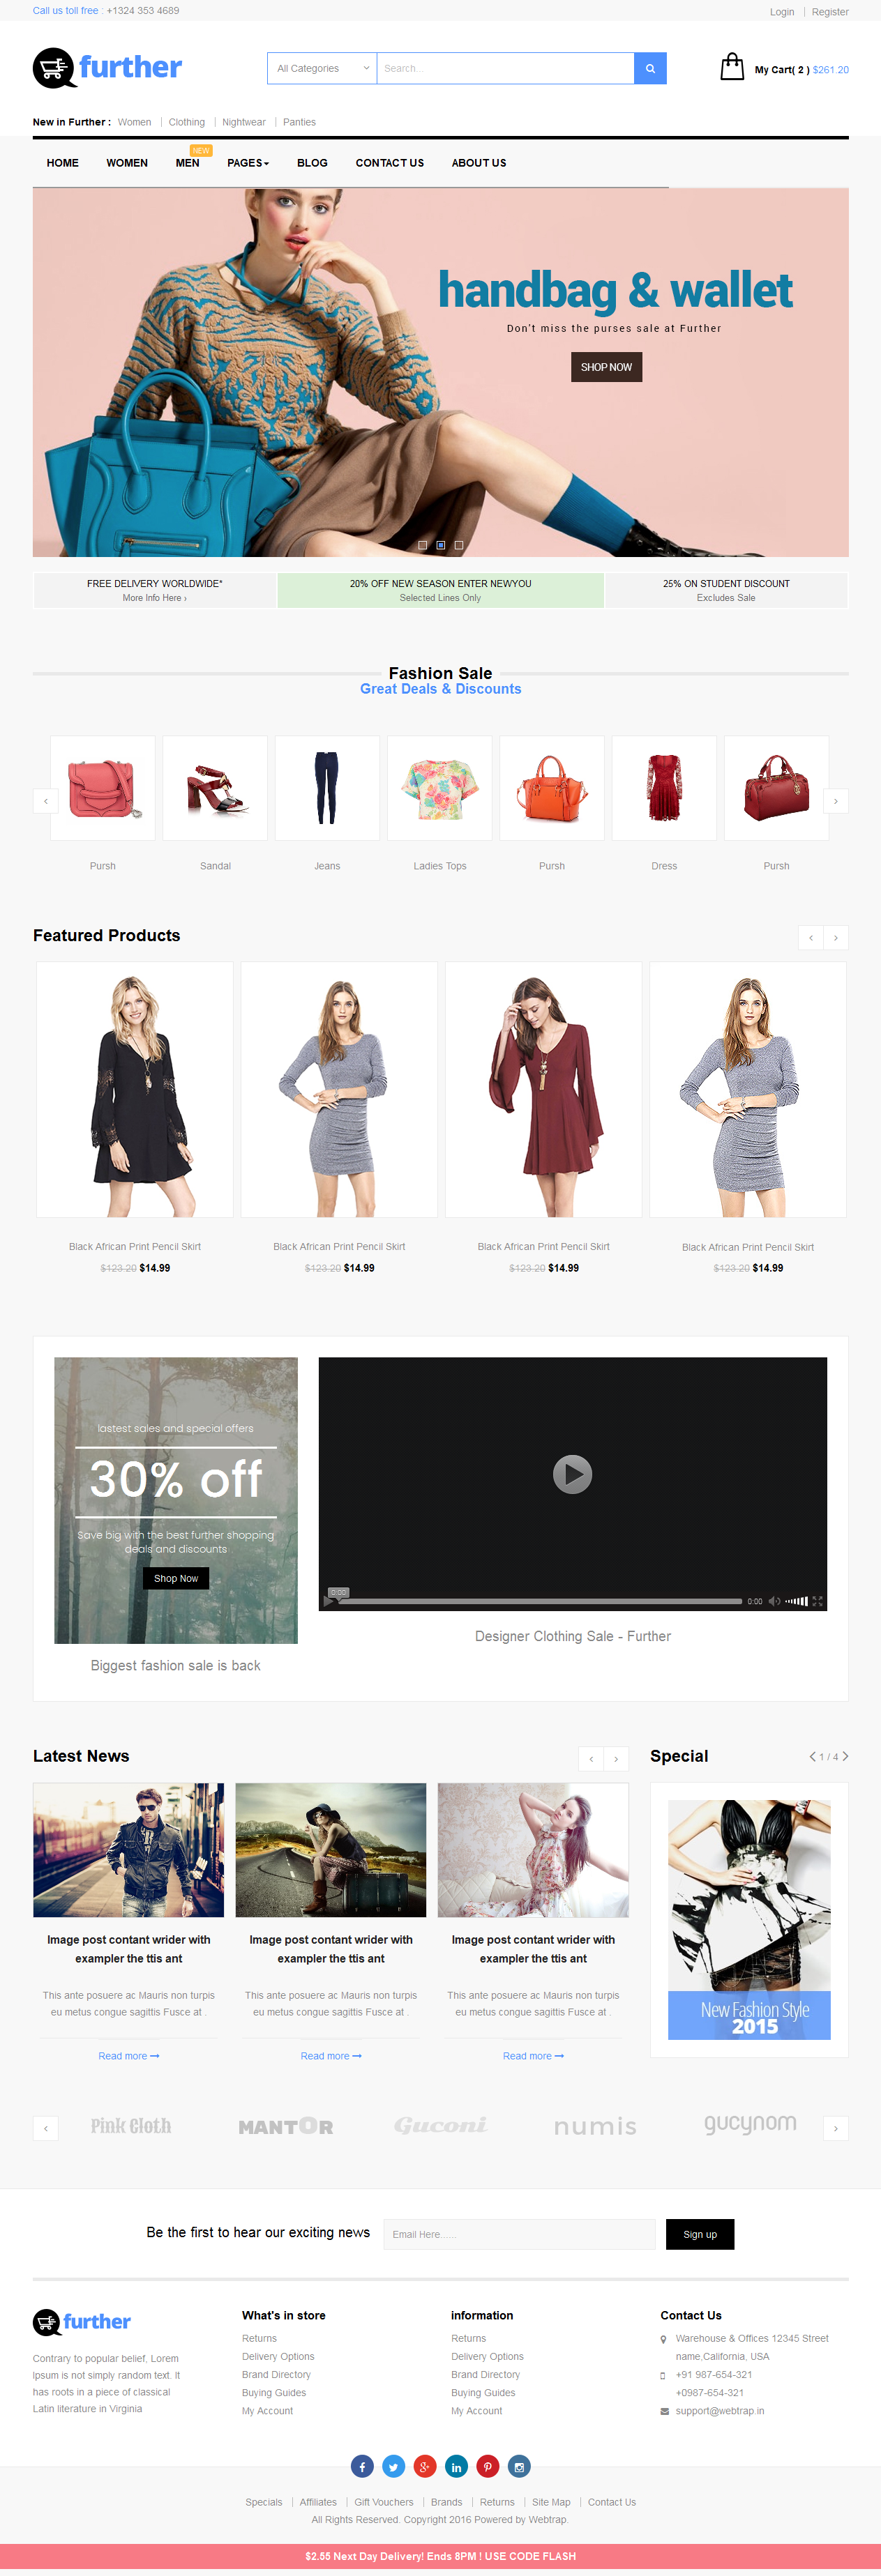 Share code html website shop thời trang online